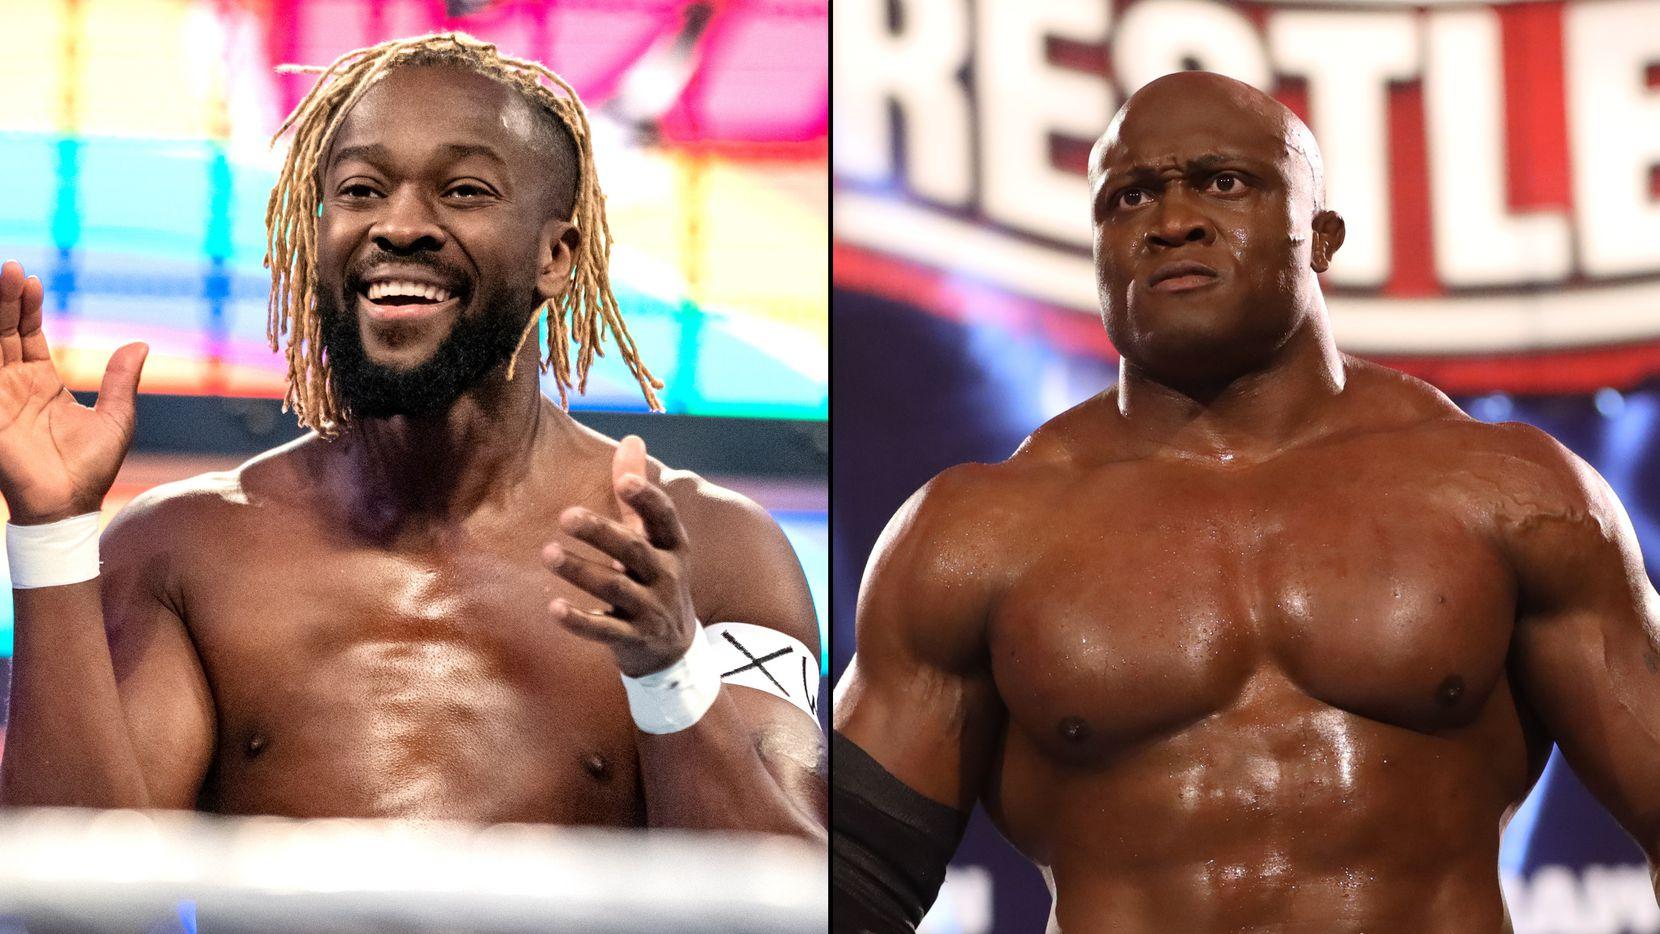 WWE superstars Kofi Kingston (left) and Bobby Lashley (right).